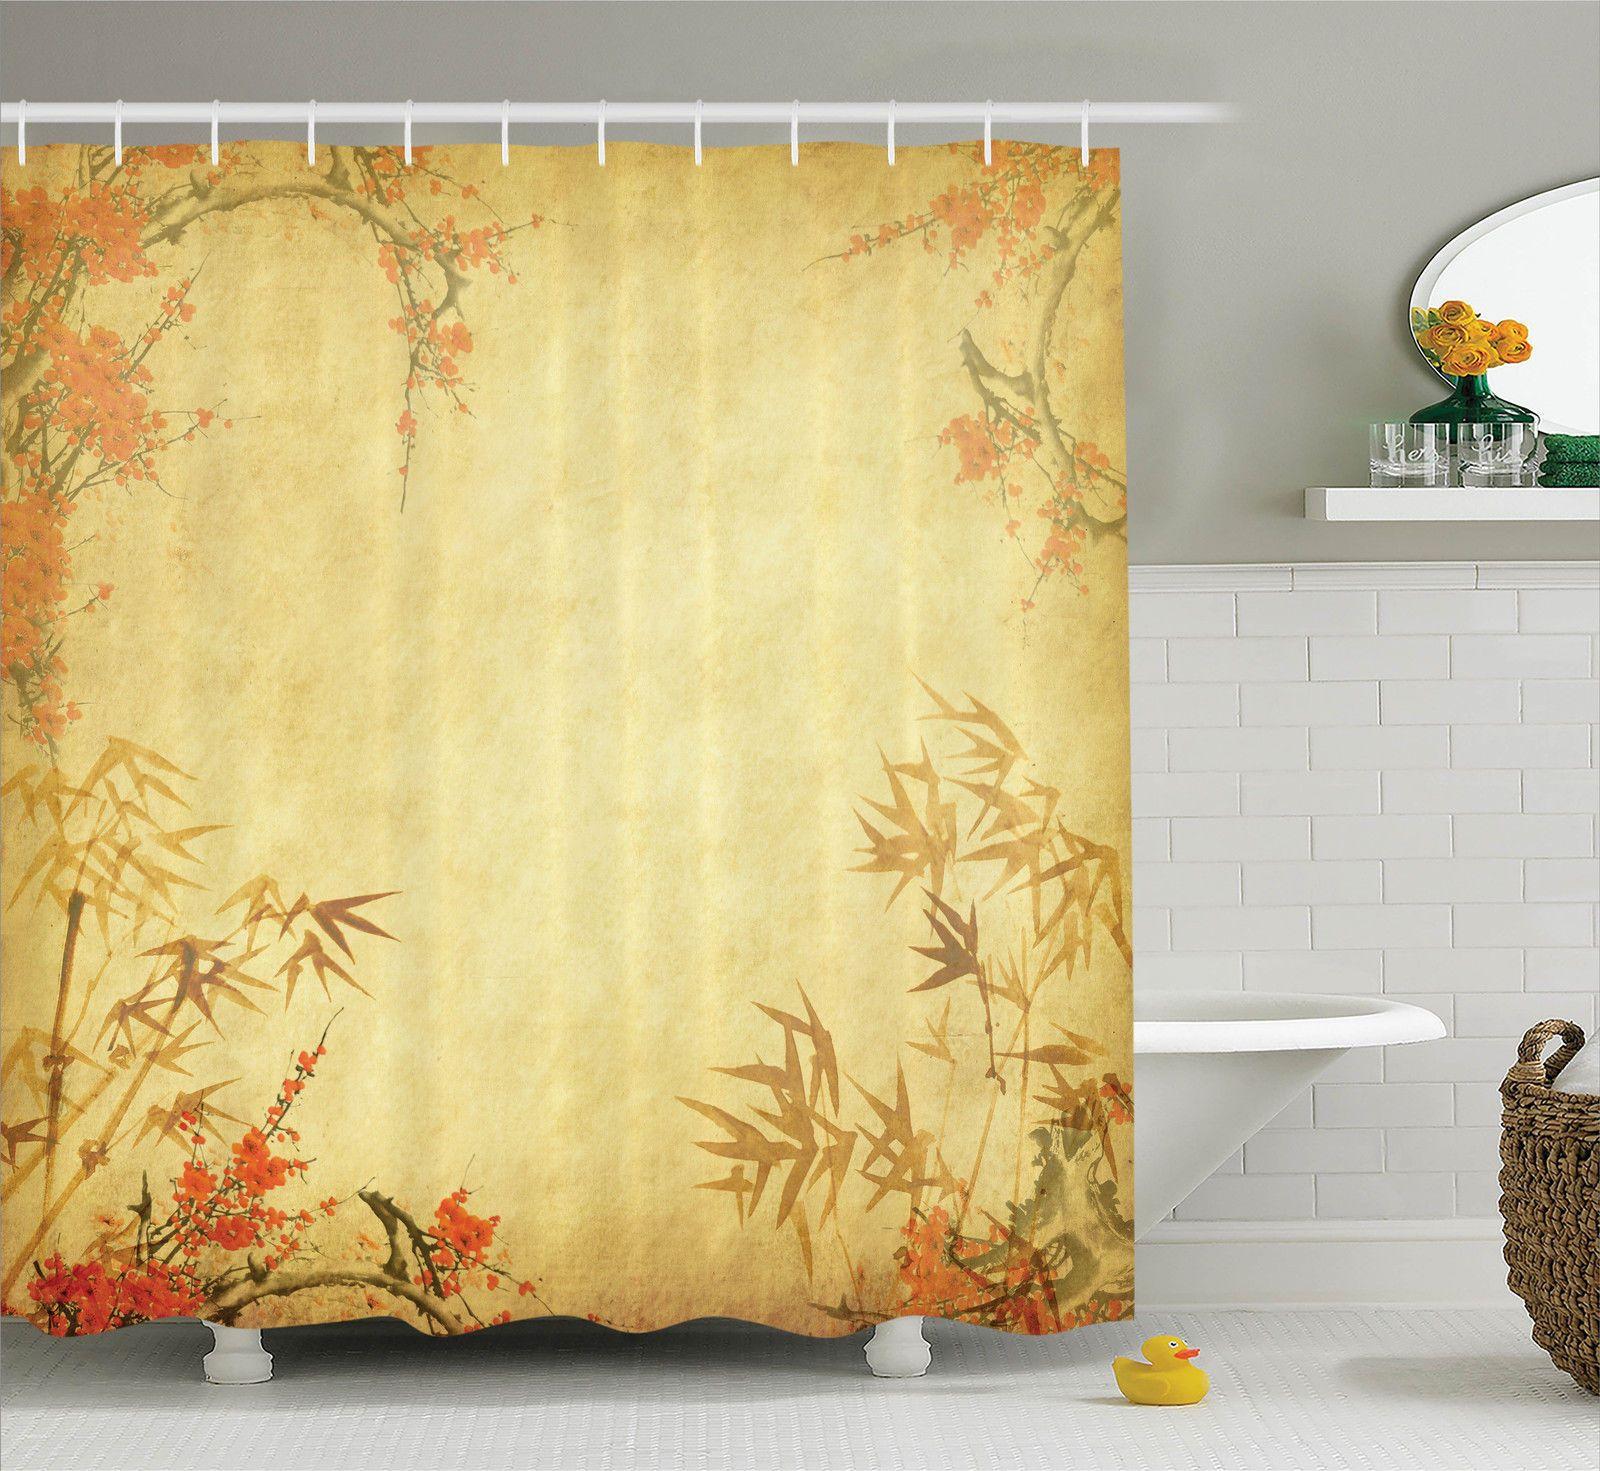 Home Shower Curtain Sets Bathroom Shower Curtain Sets Flower